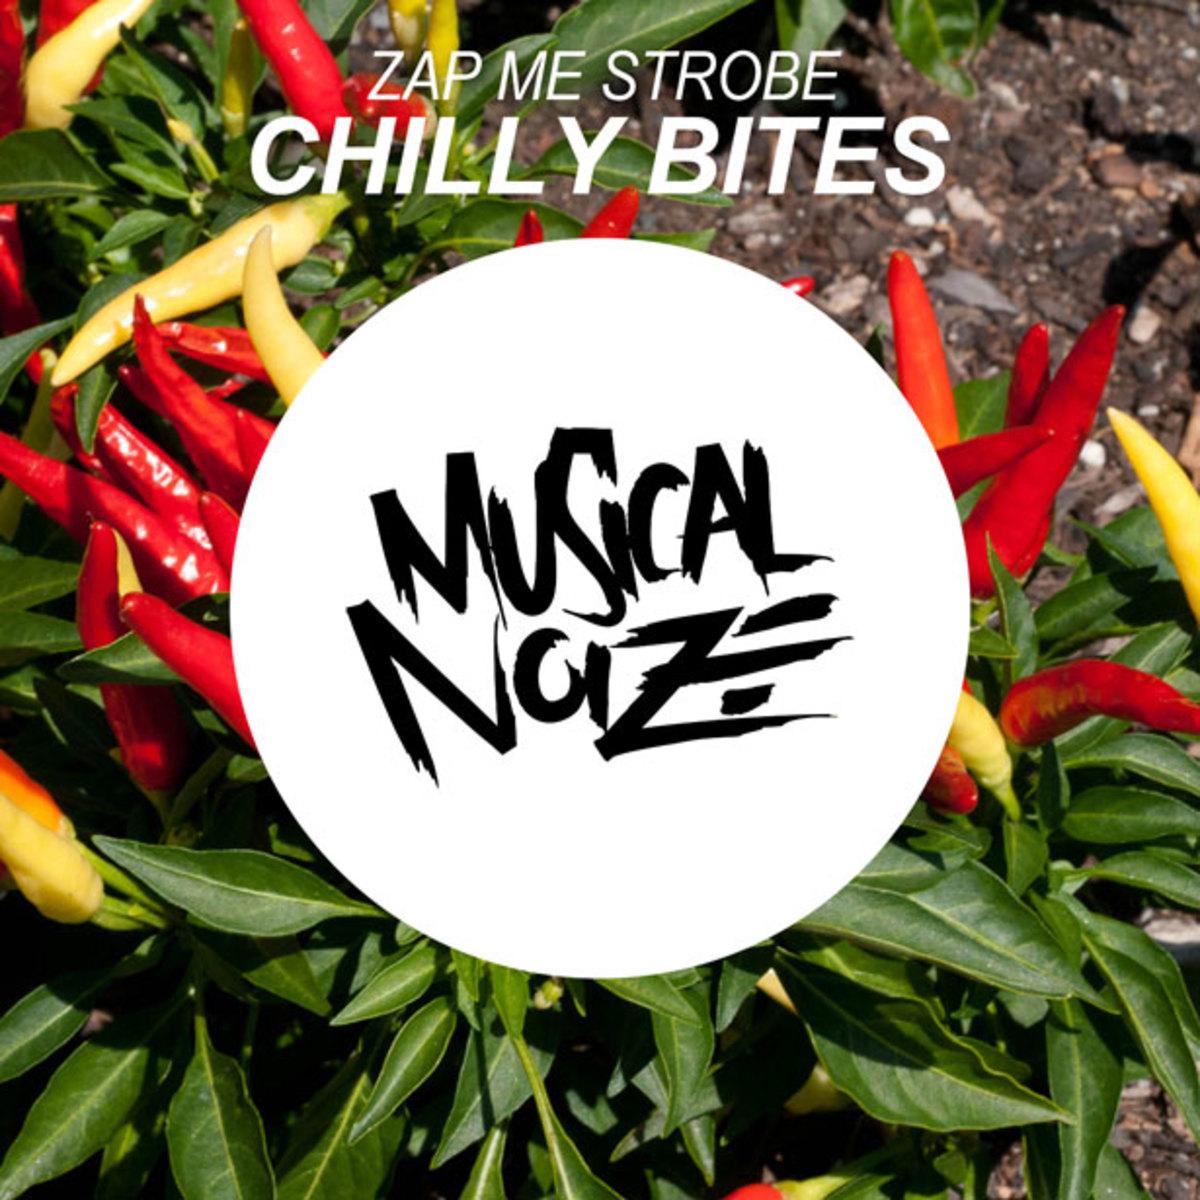 Spotlight: Zap Me Strobe - Chilly bites (Original Mix) Via Musical Noize